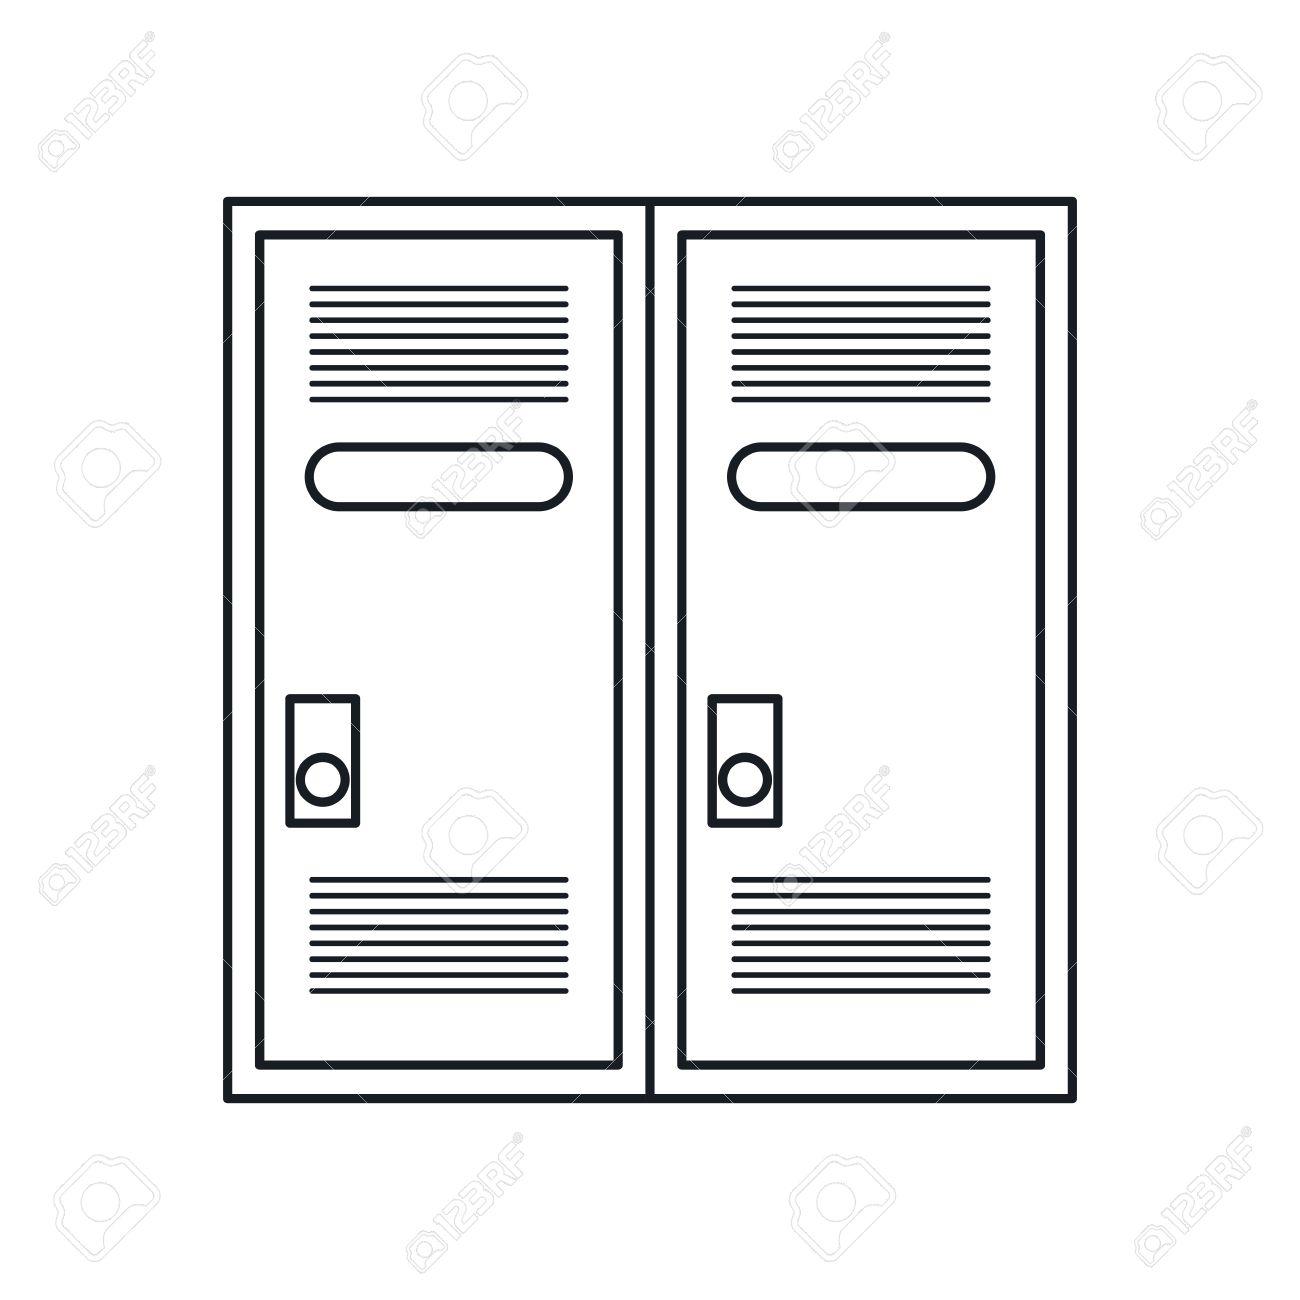 1300x1300 Locker Room American Football Outline Vector Illustration Eps